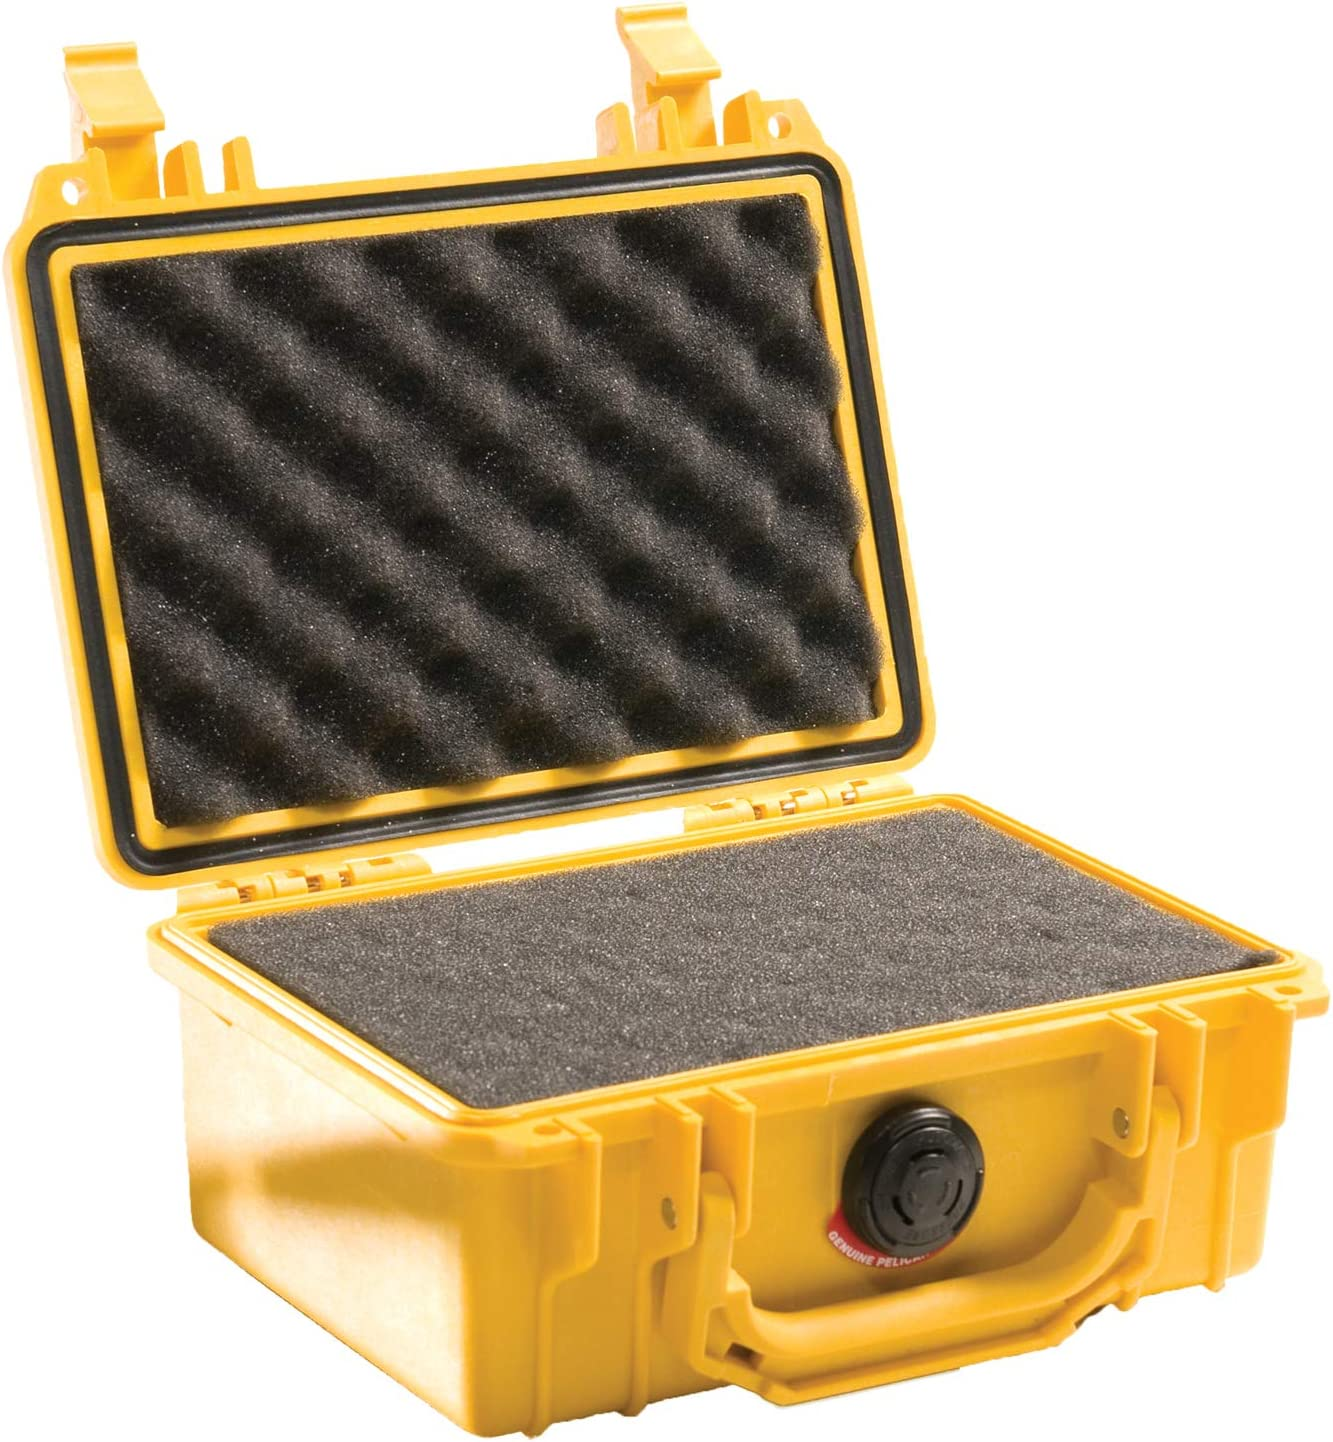 Pelican 1120 Case With Foam (Yellow)